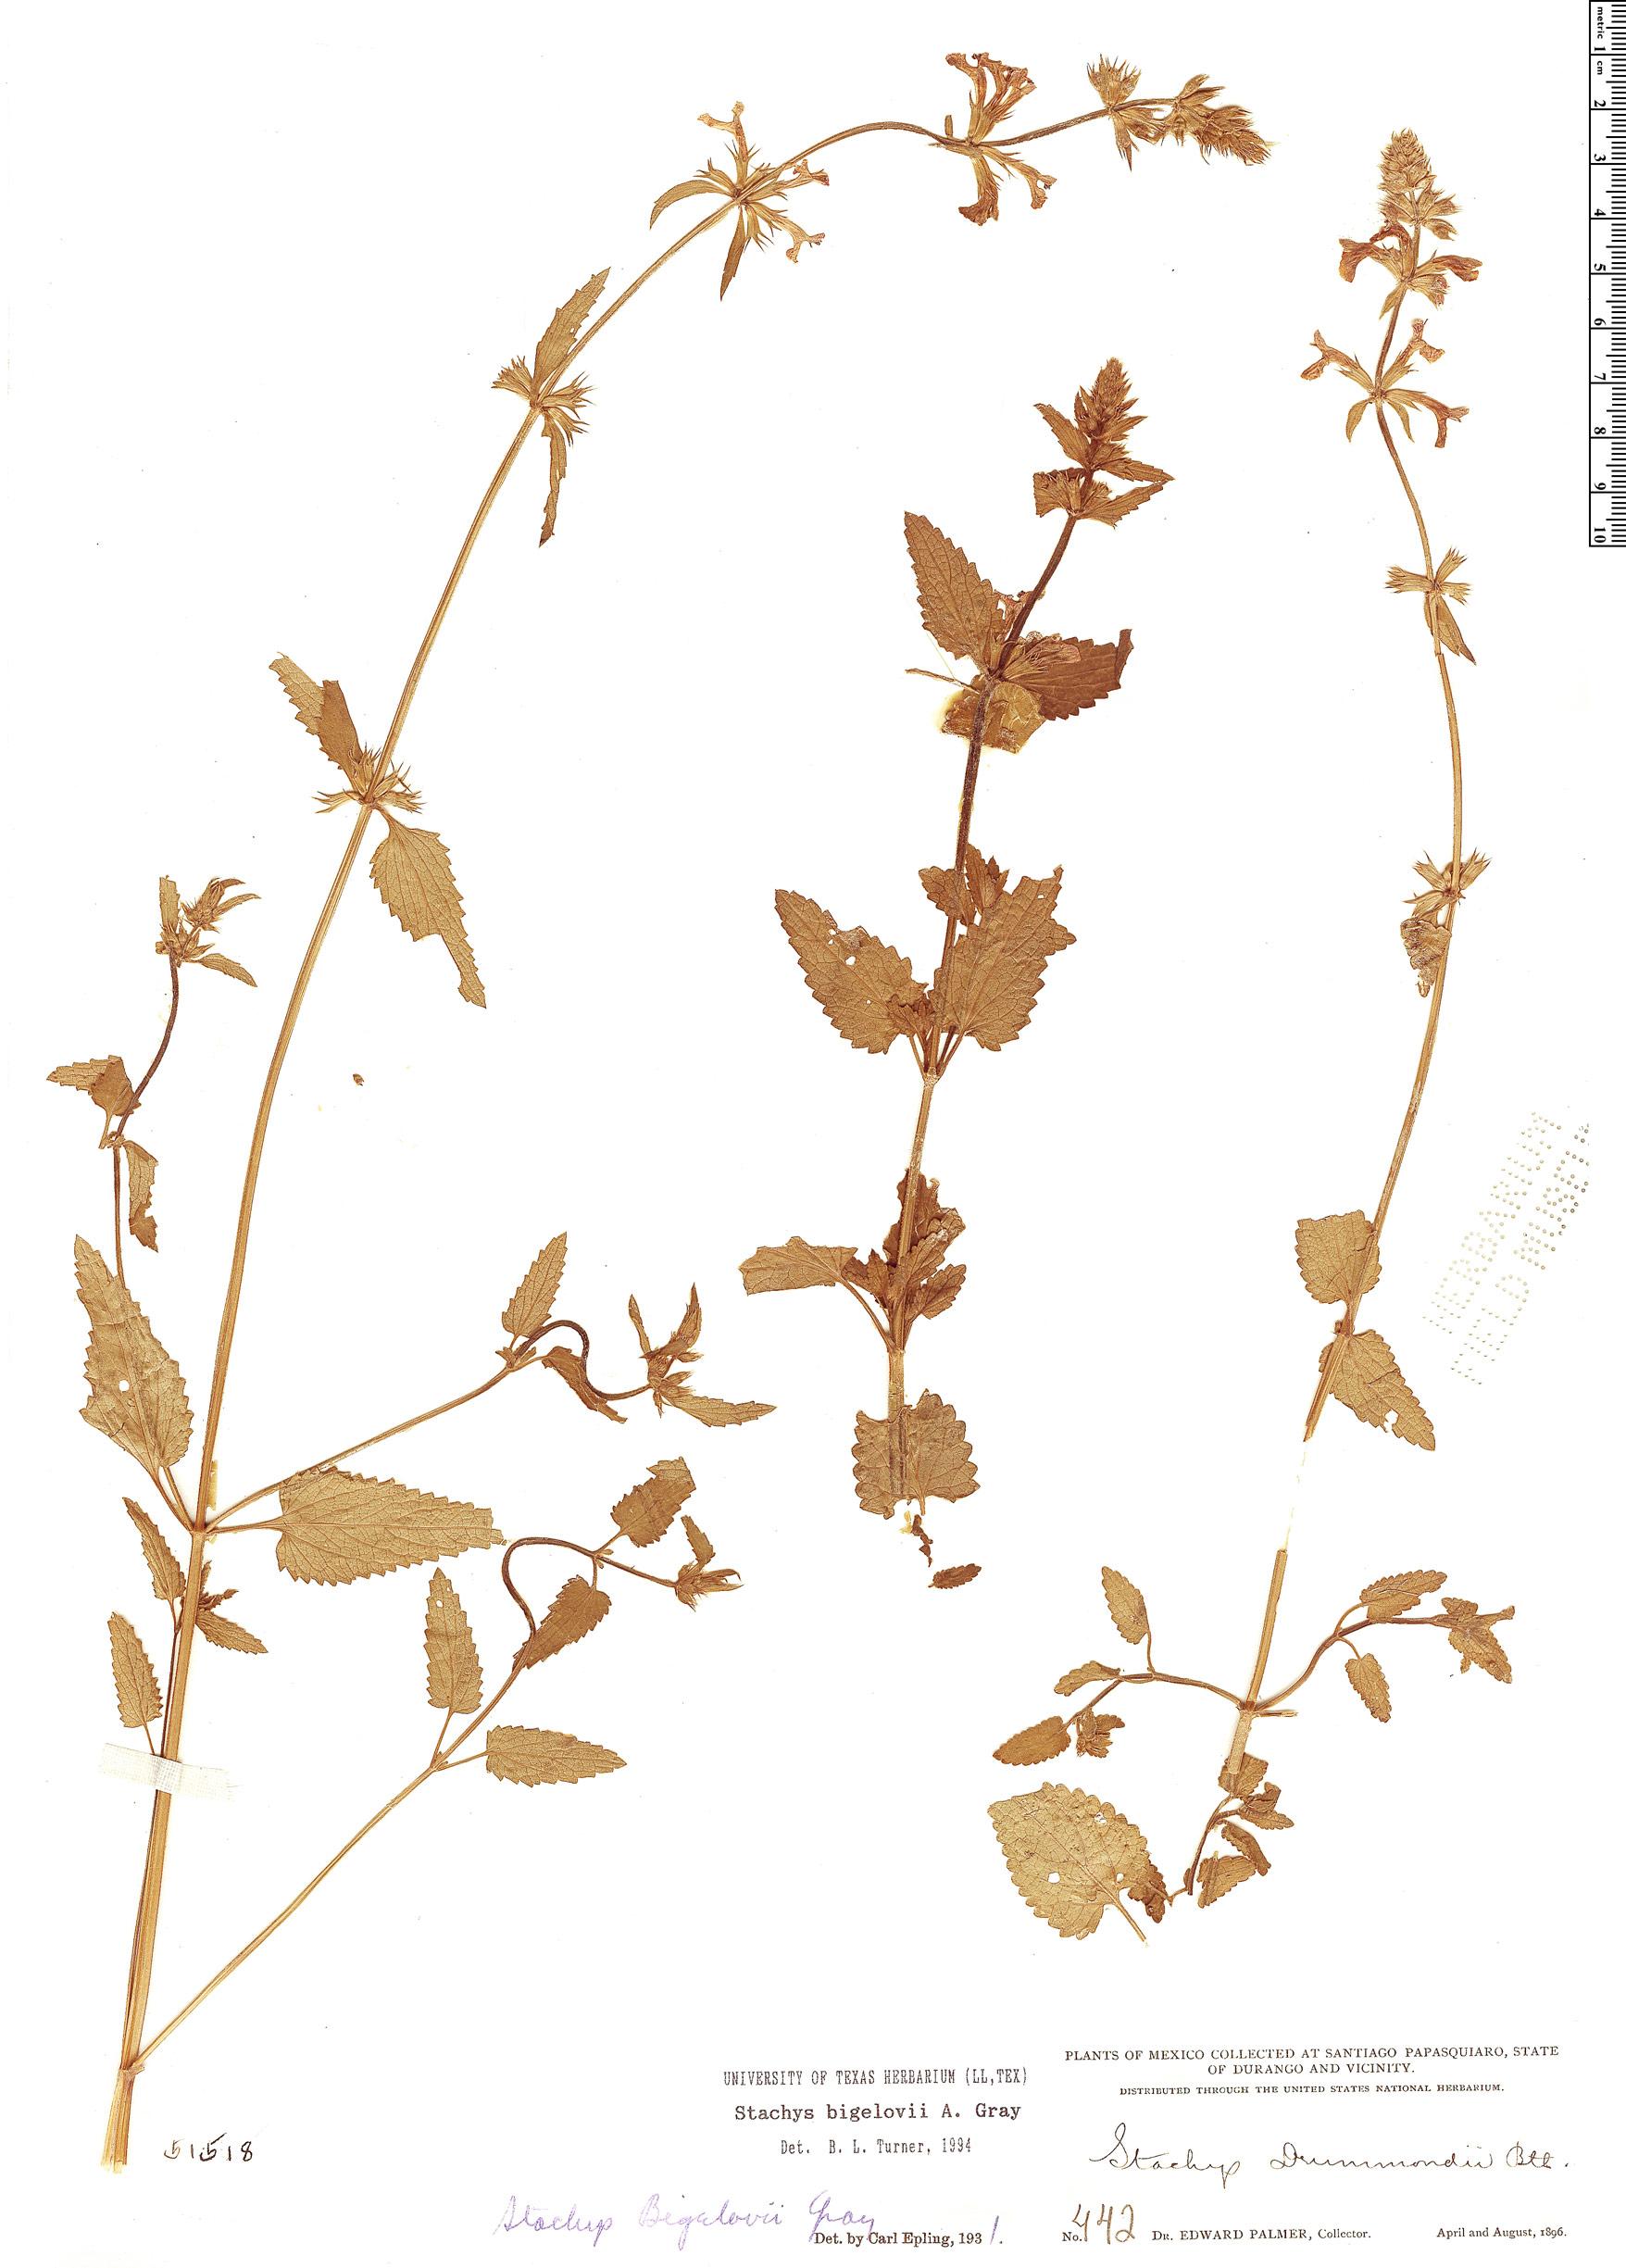 Specimen: Stachys bigelovii